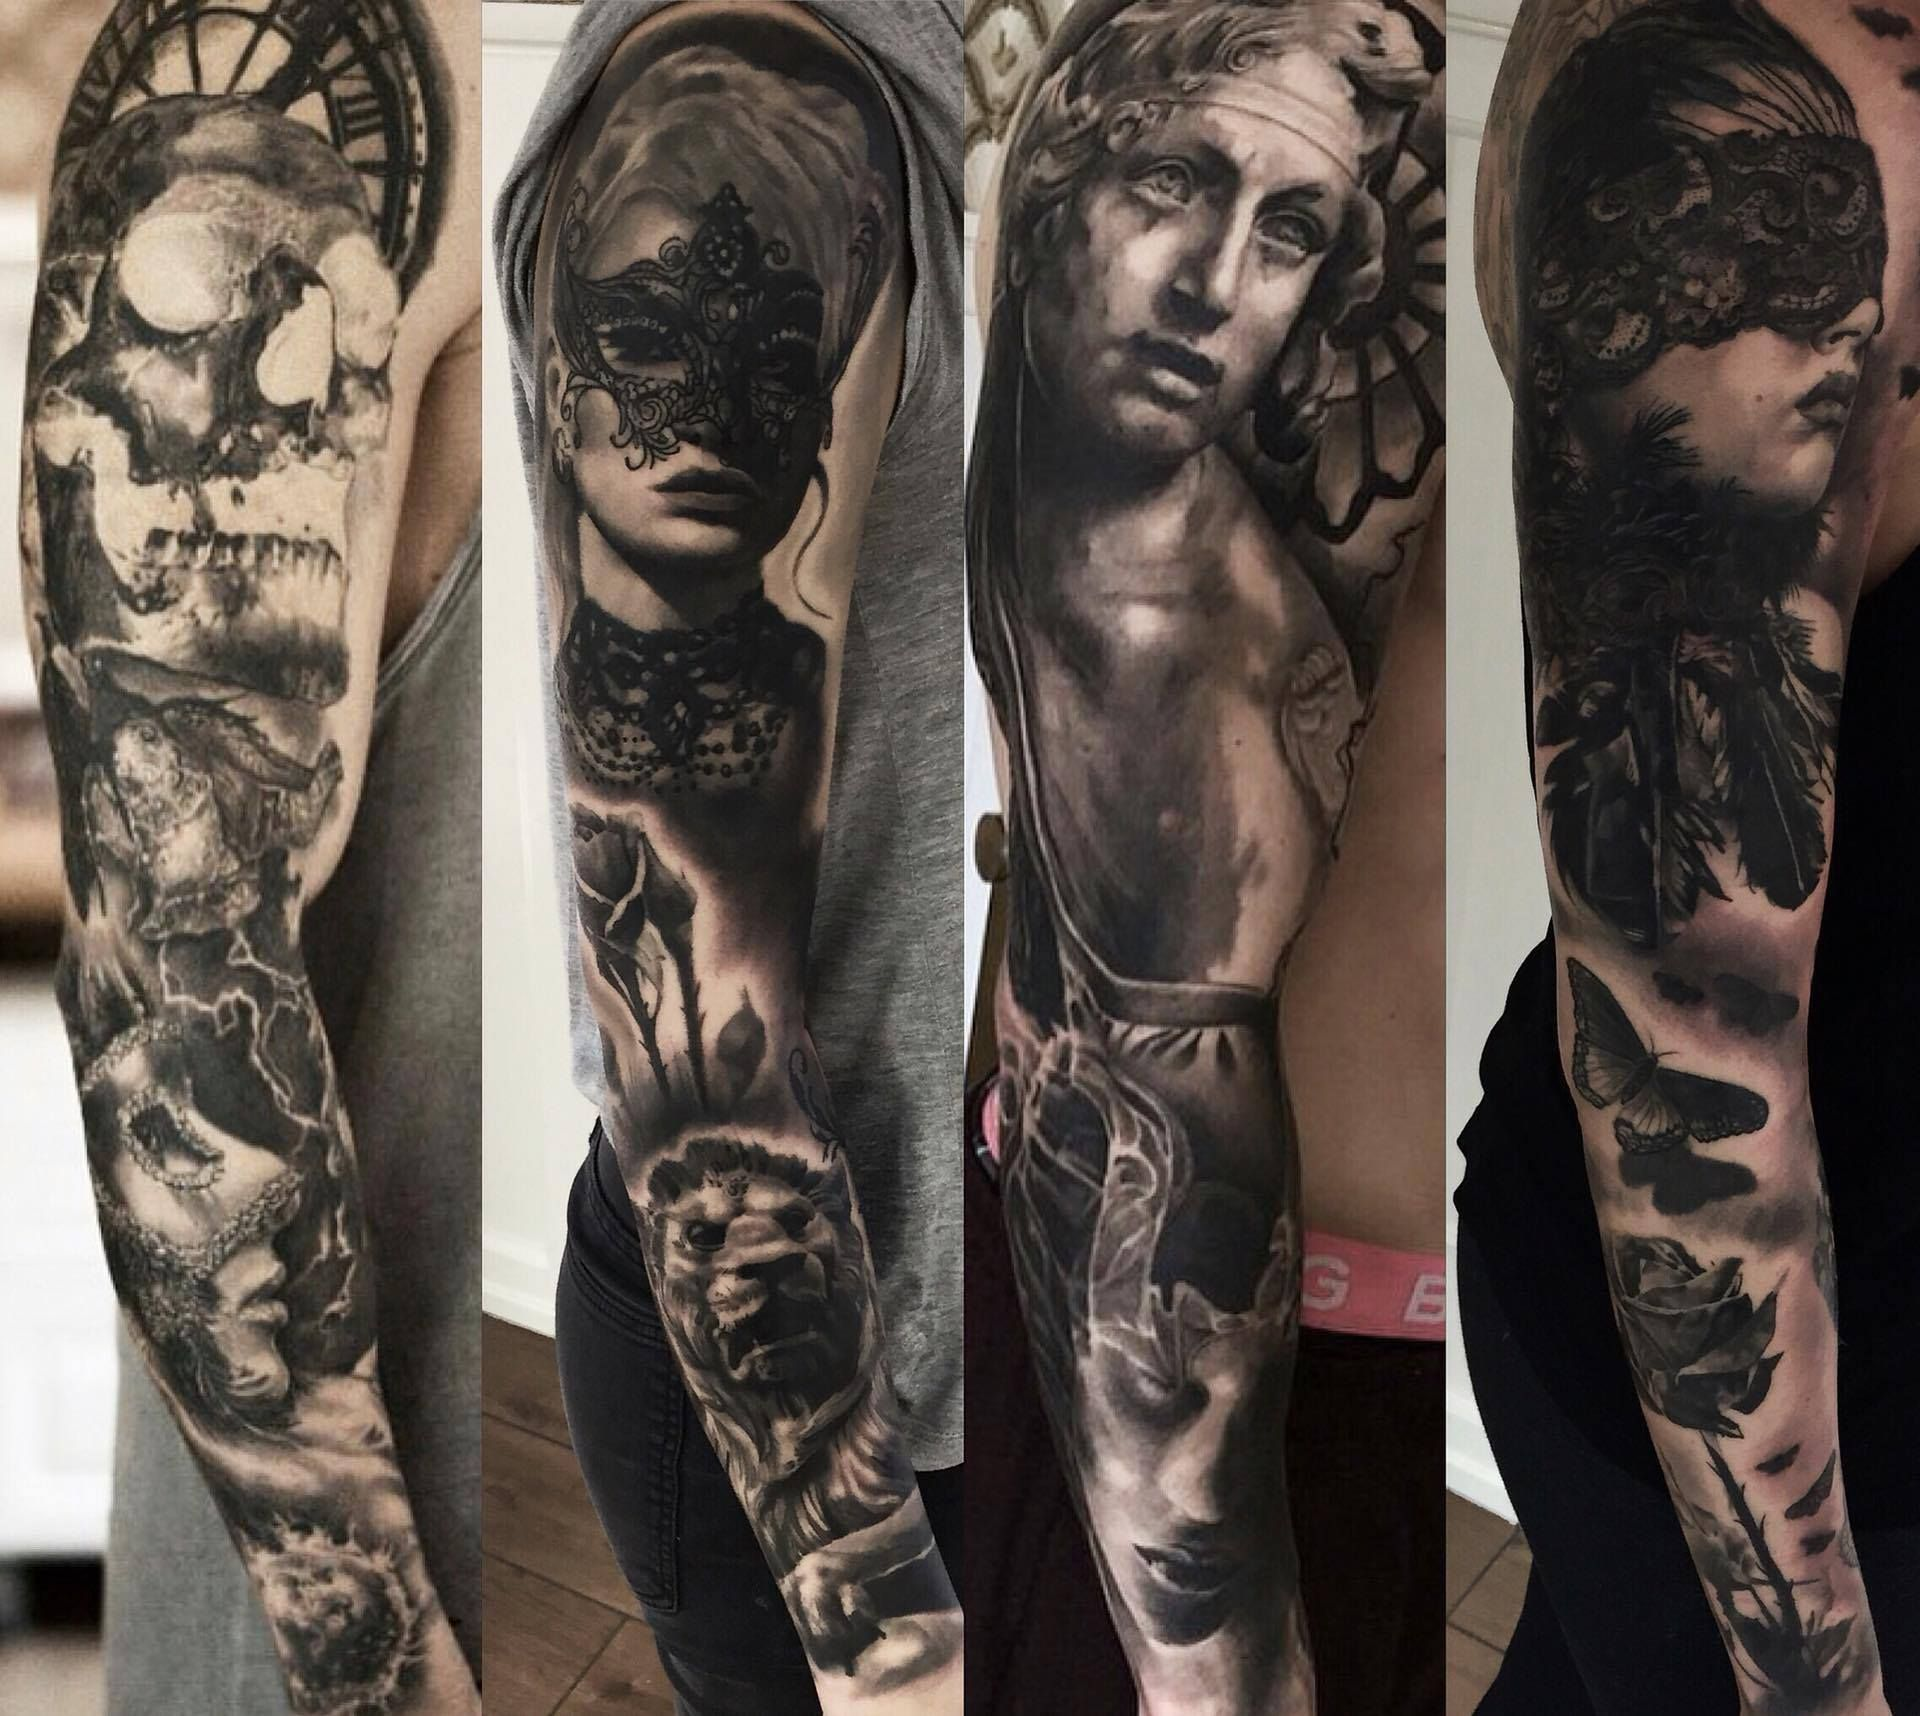 Mark Wosgerau Sinners Ink Aarhus Denmark 8th Tattoos